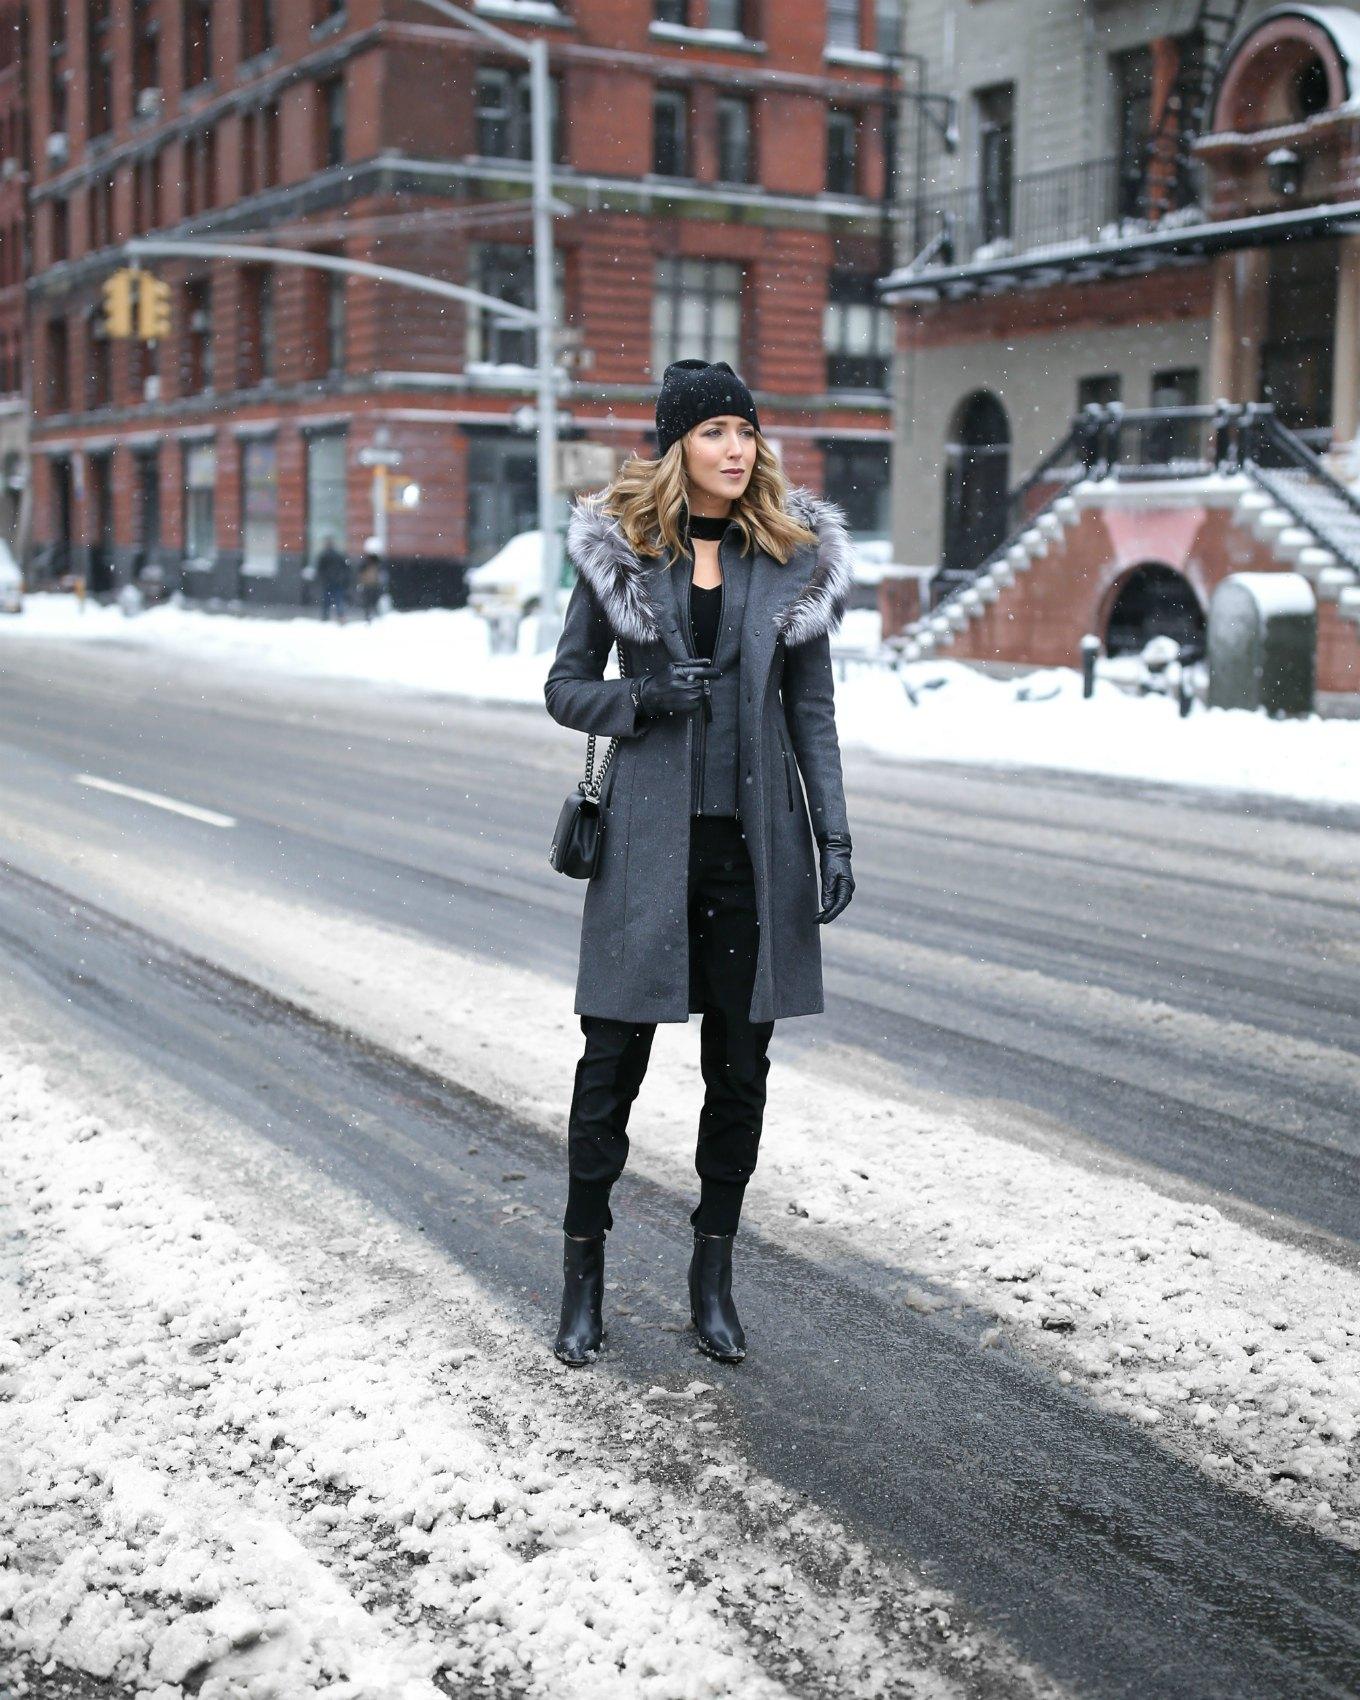 mackage-grey-wool-fur-hood-coat-choker-neck-sweater-track-pants-beanie-nyc-street-style-fashion-week-snow-mary-orton1